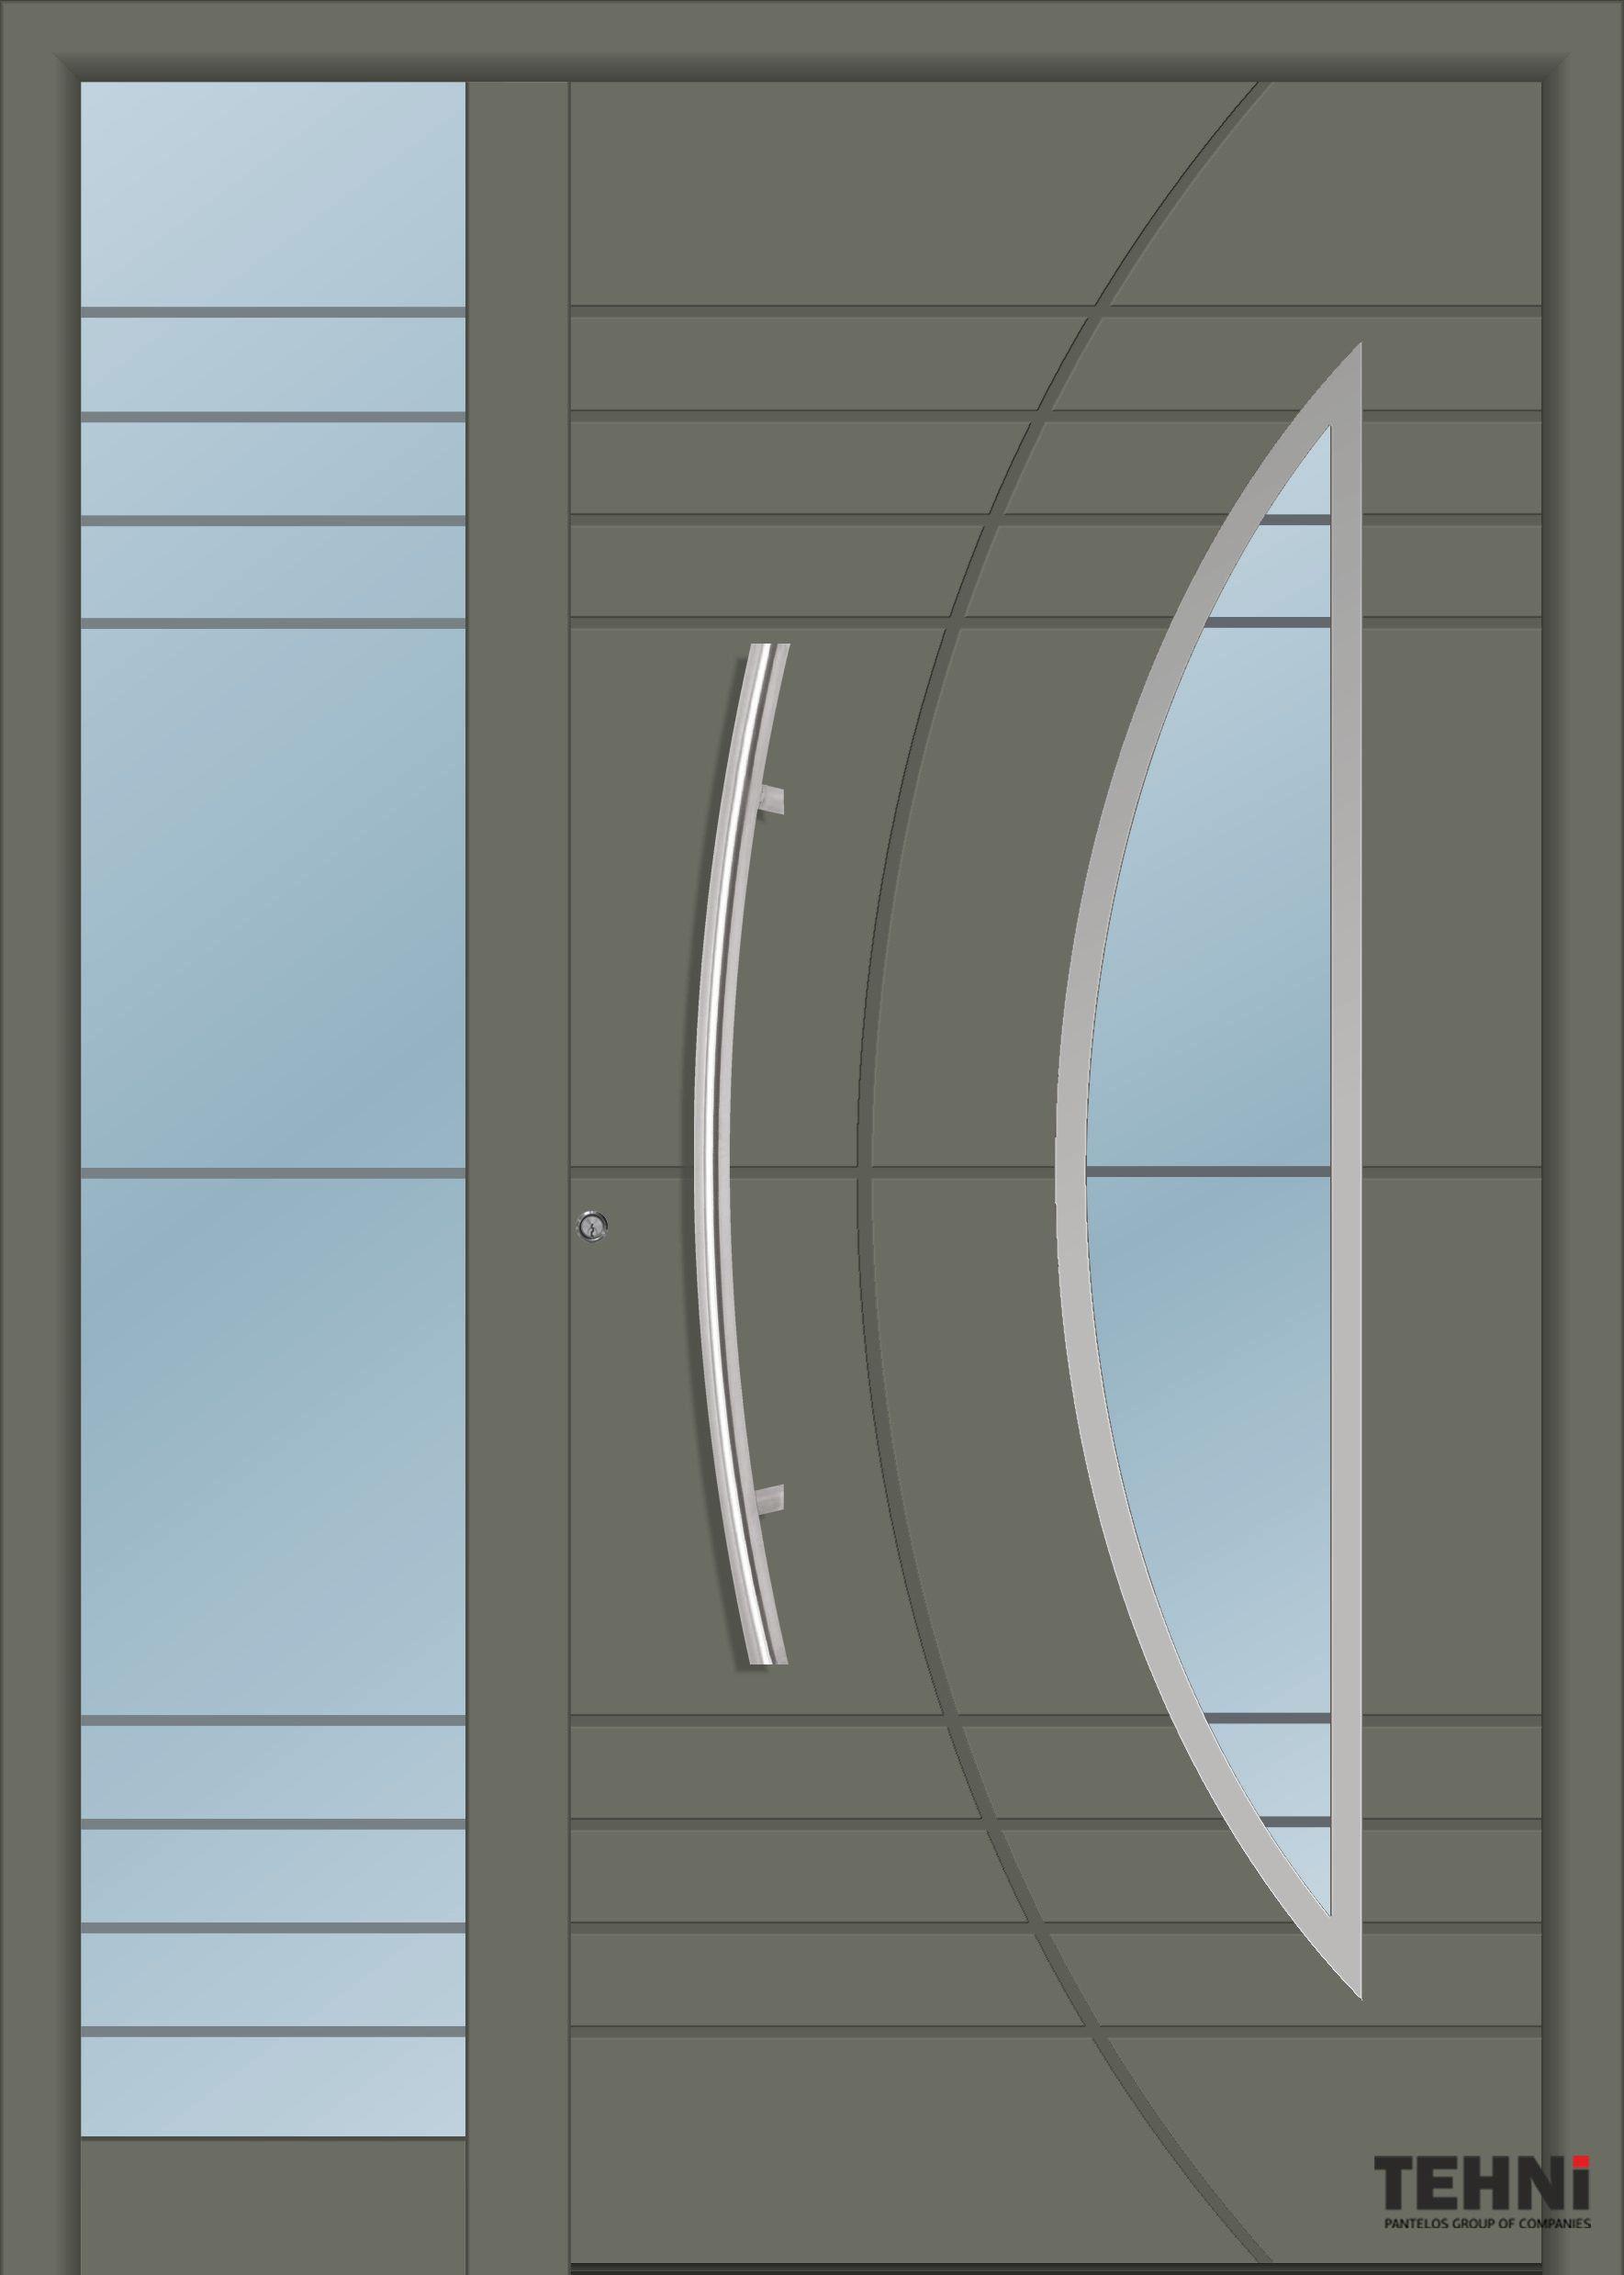 Amazing Beautiful Design Entrance Doors Tehni S A Pantelos Group Tehni Pantelos Doors Door Interiordesign Designindustry Entrance Doors Entrance Decor